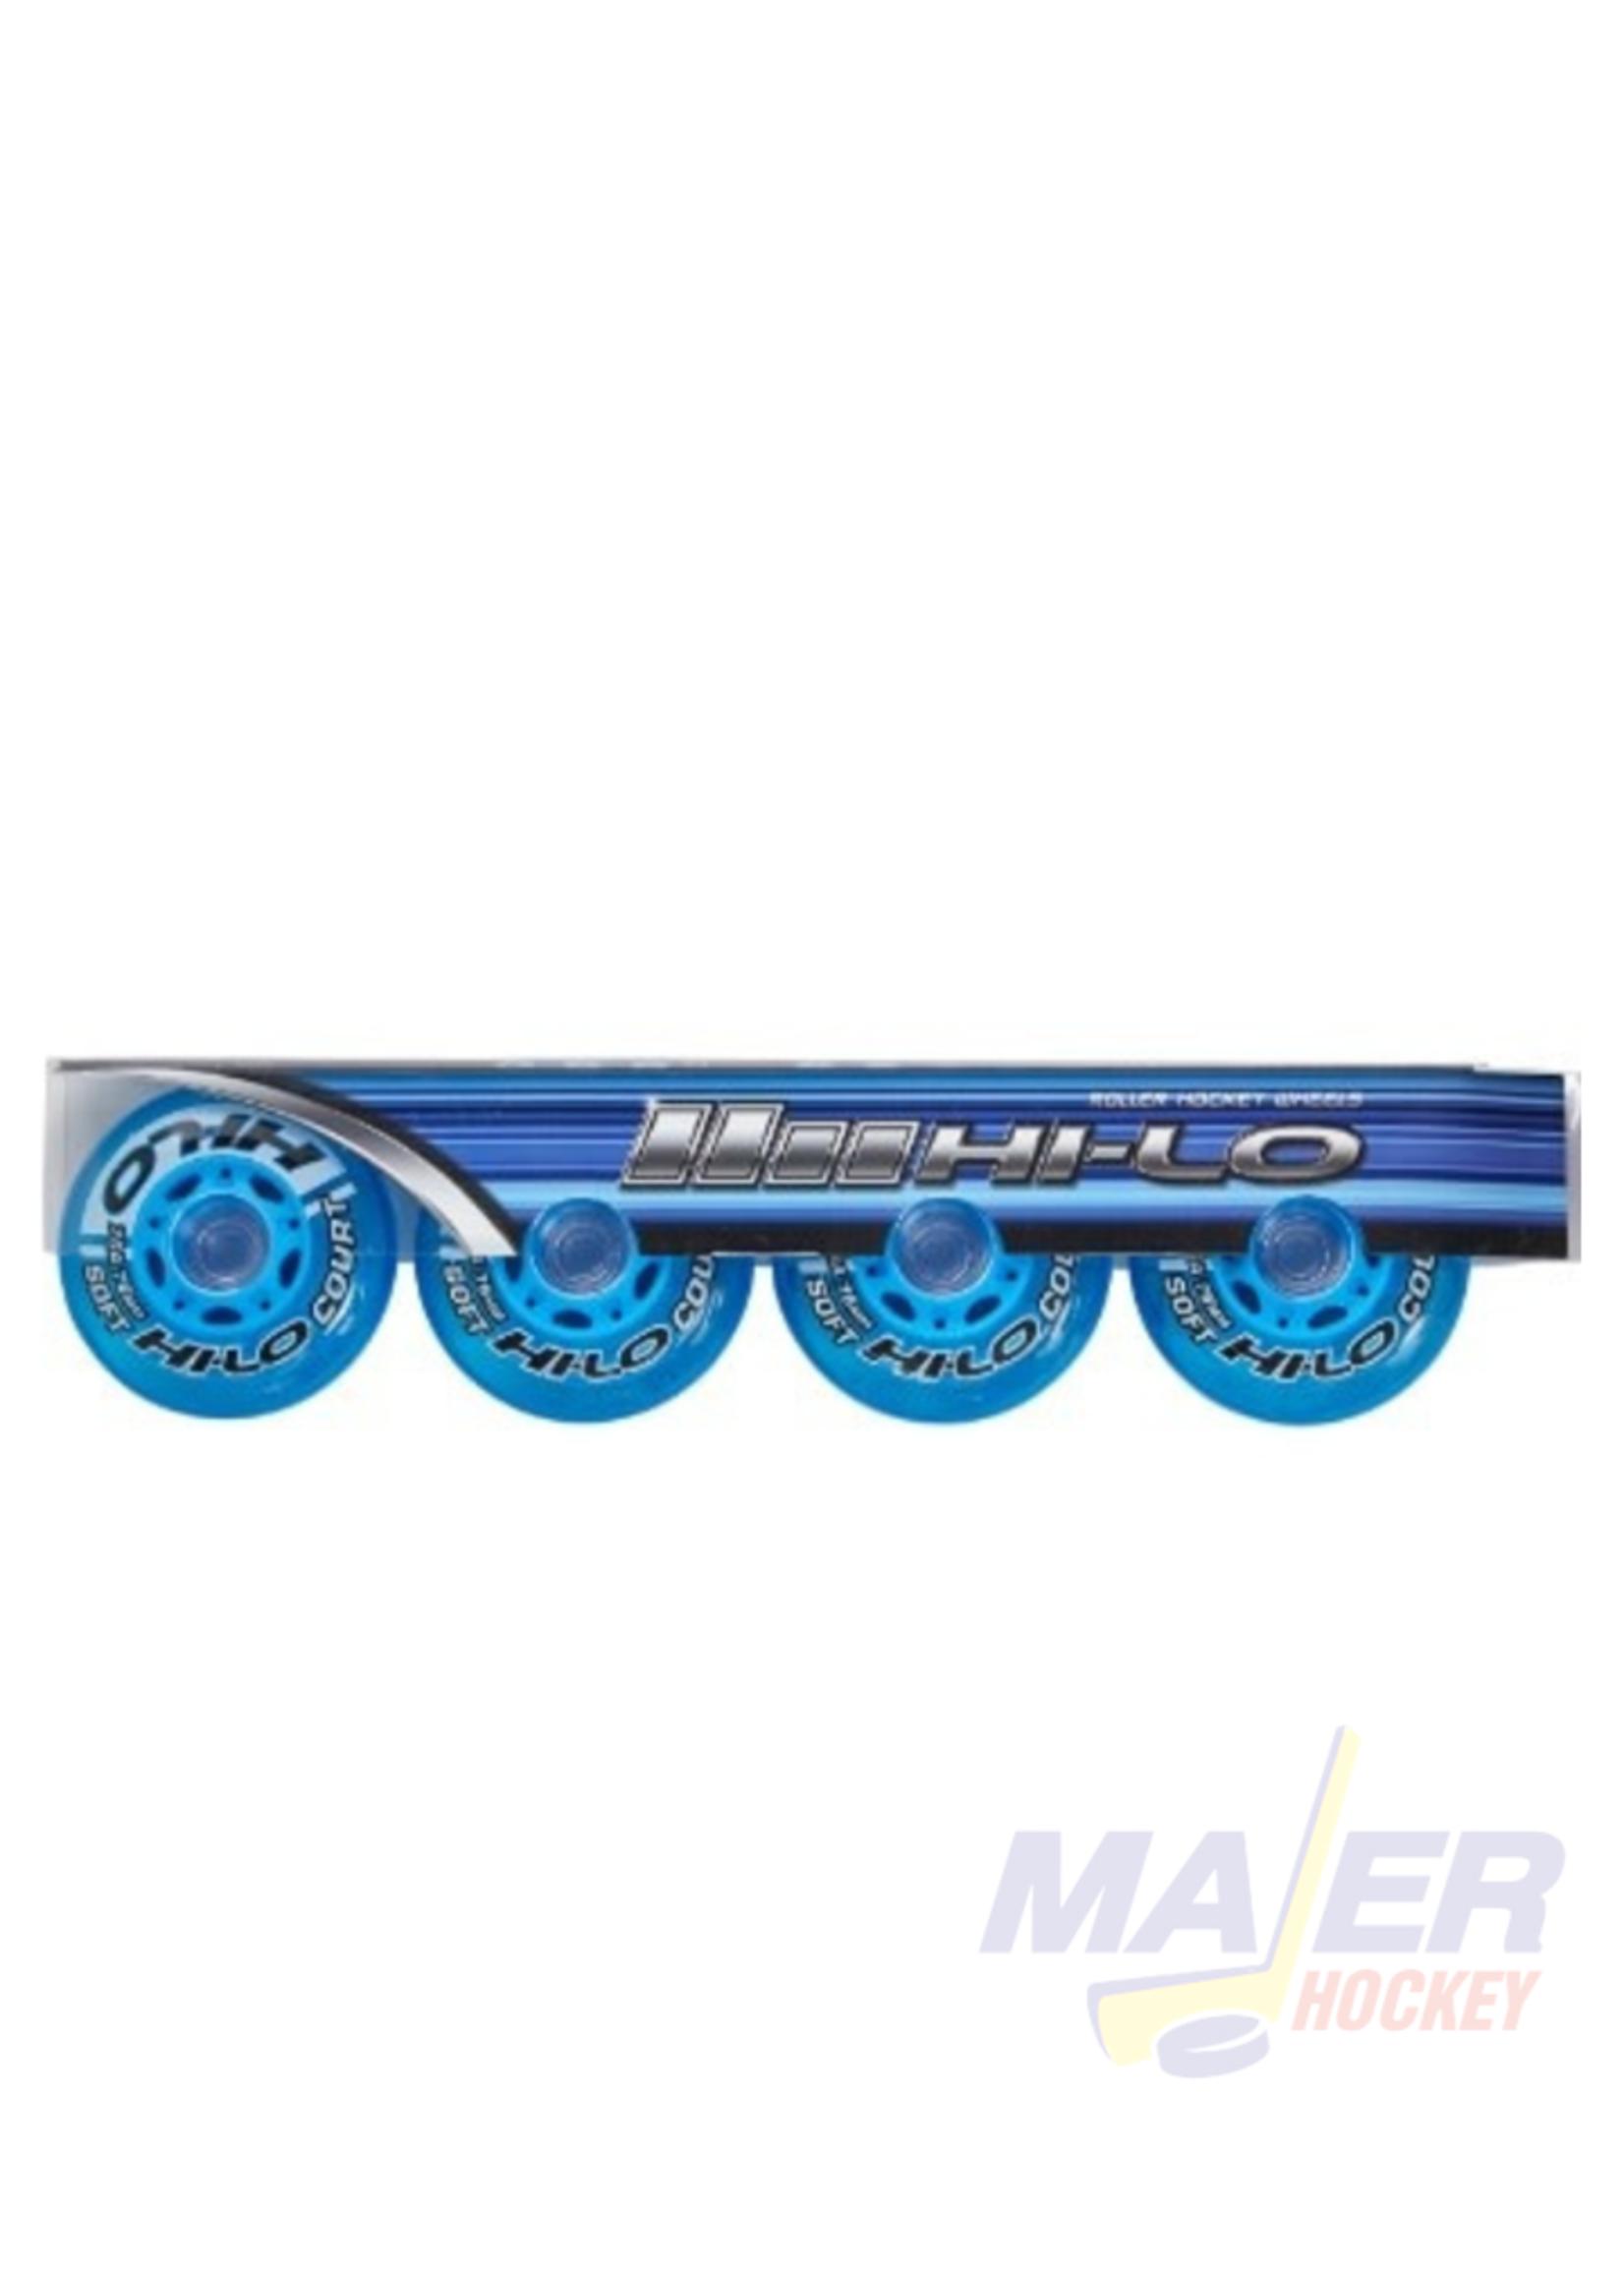 Bauer Hi-Lo Inline skate Court Wheels 59mm/76A 4PK